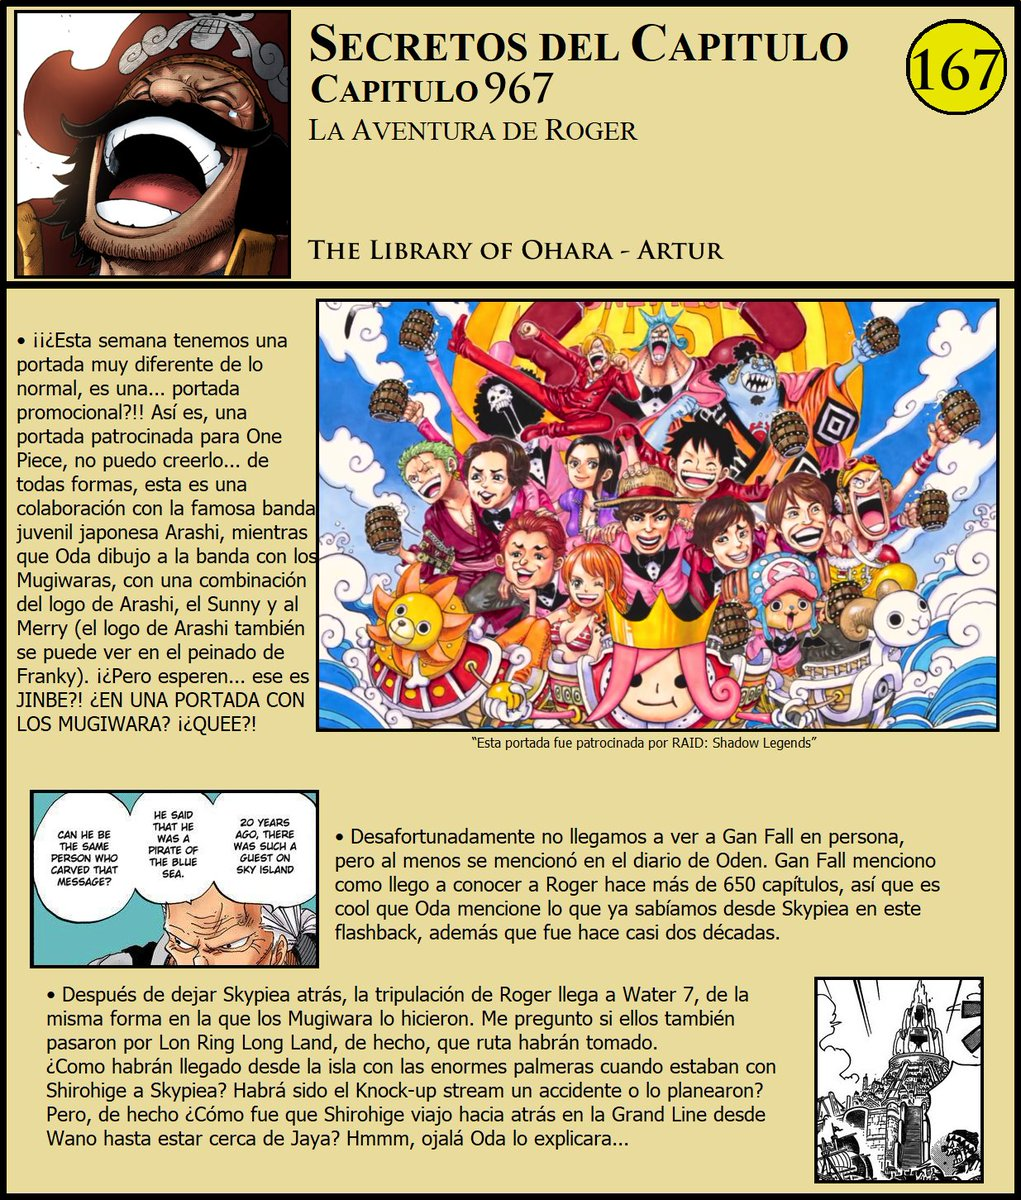 Secretos & Curiosidades - One Piece Manga 967 EOOY0gPXUAEPNVf